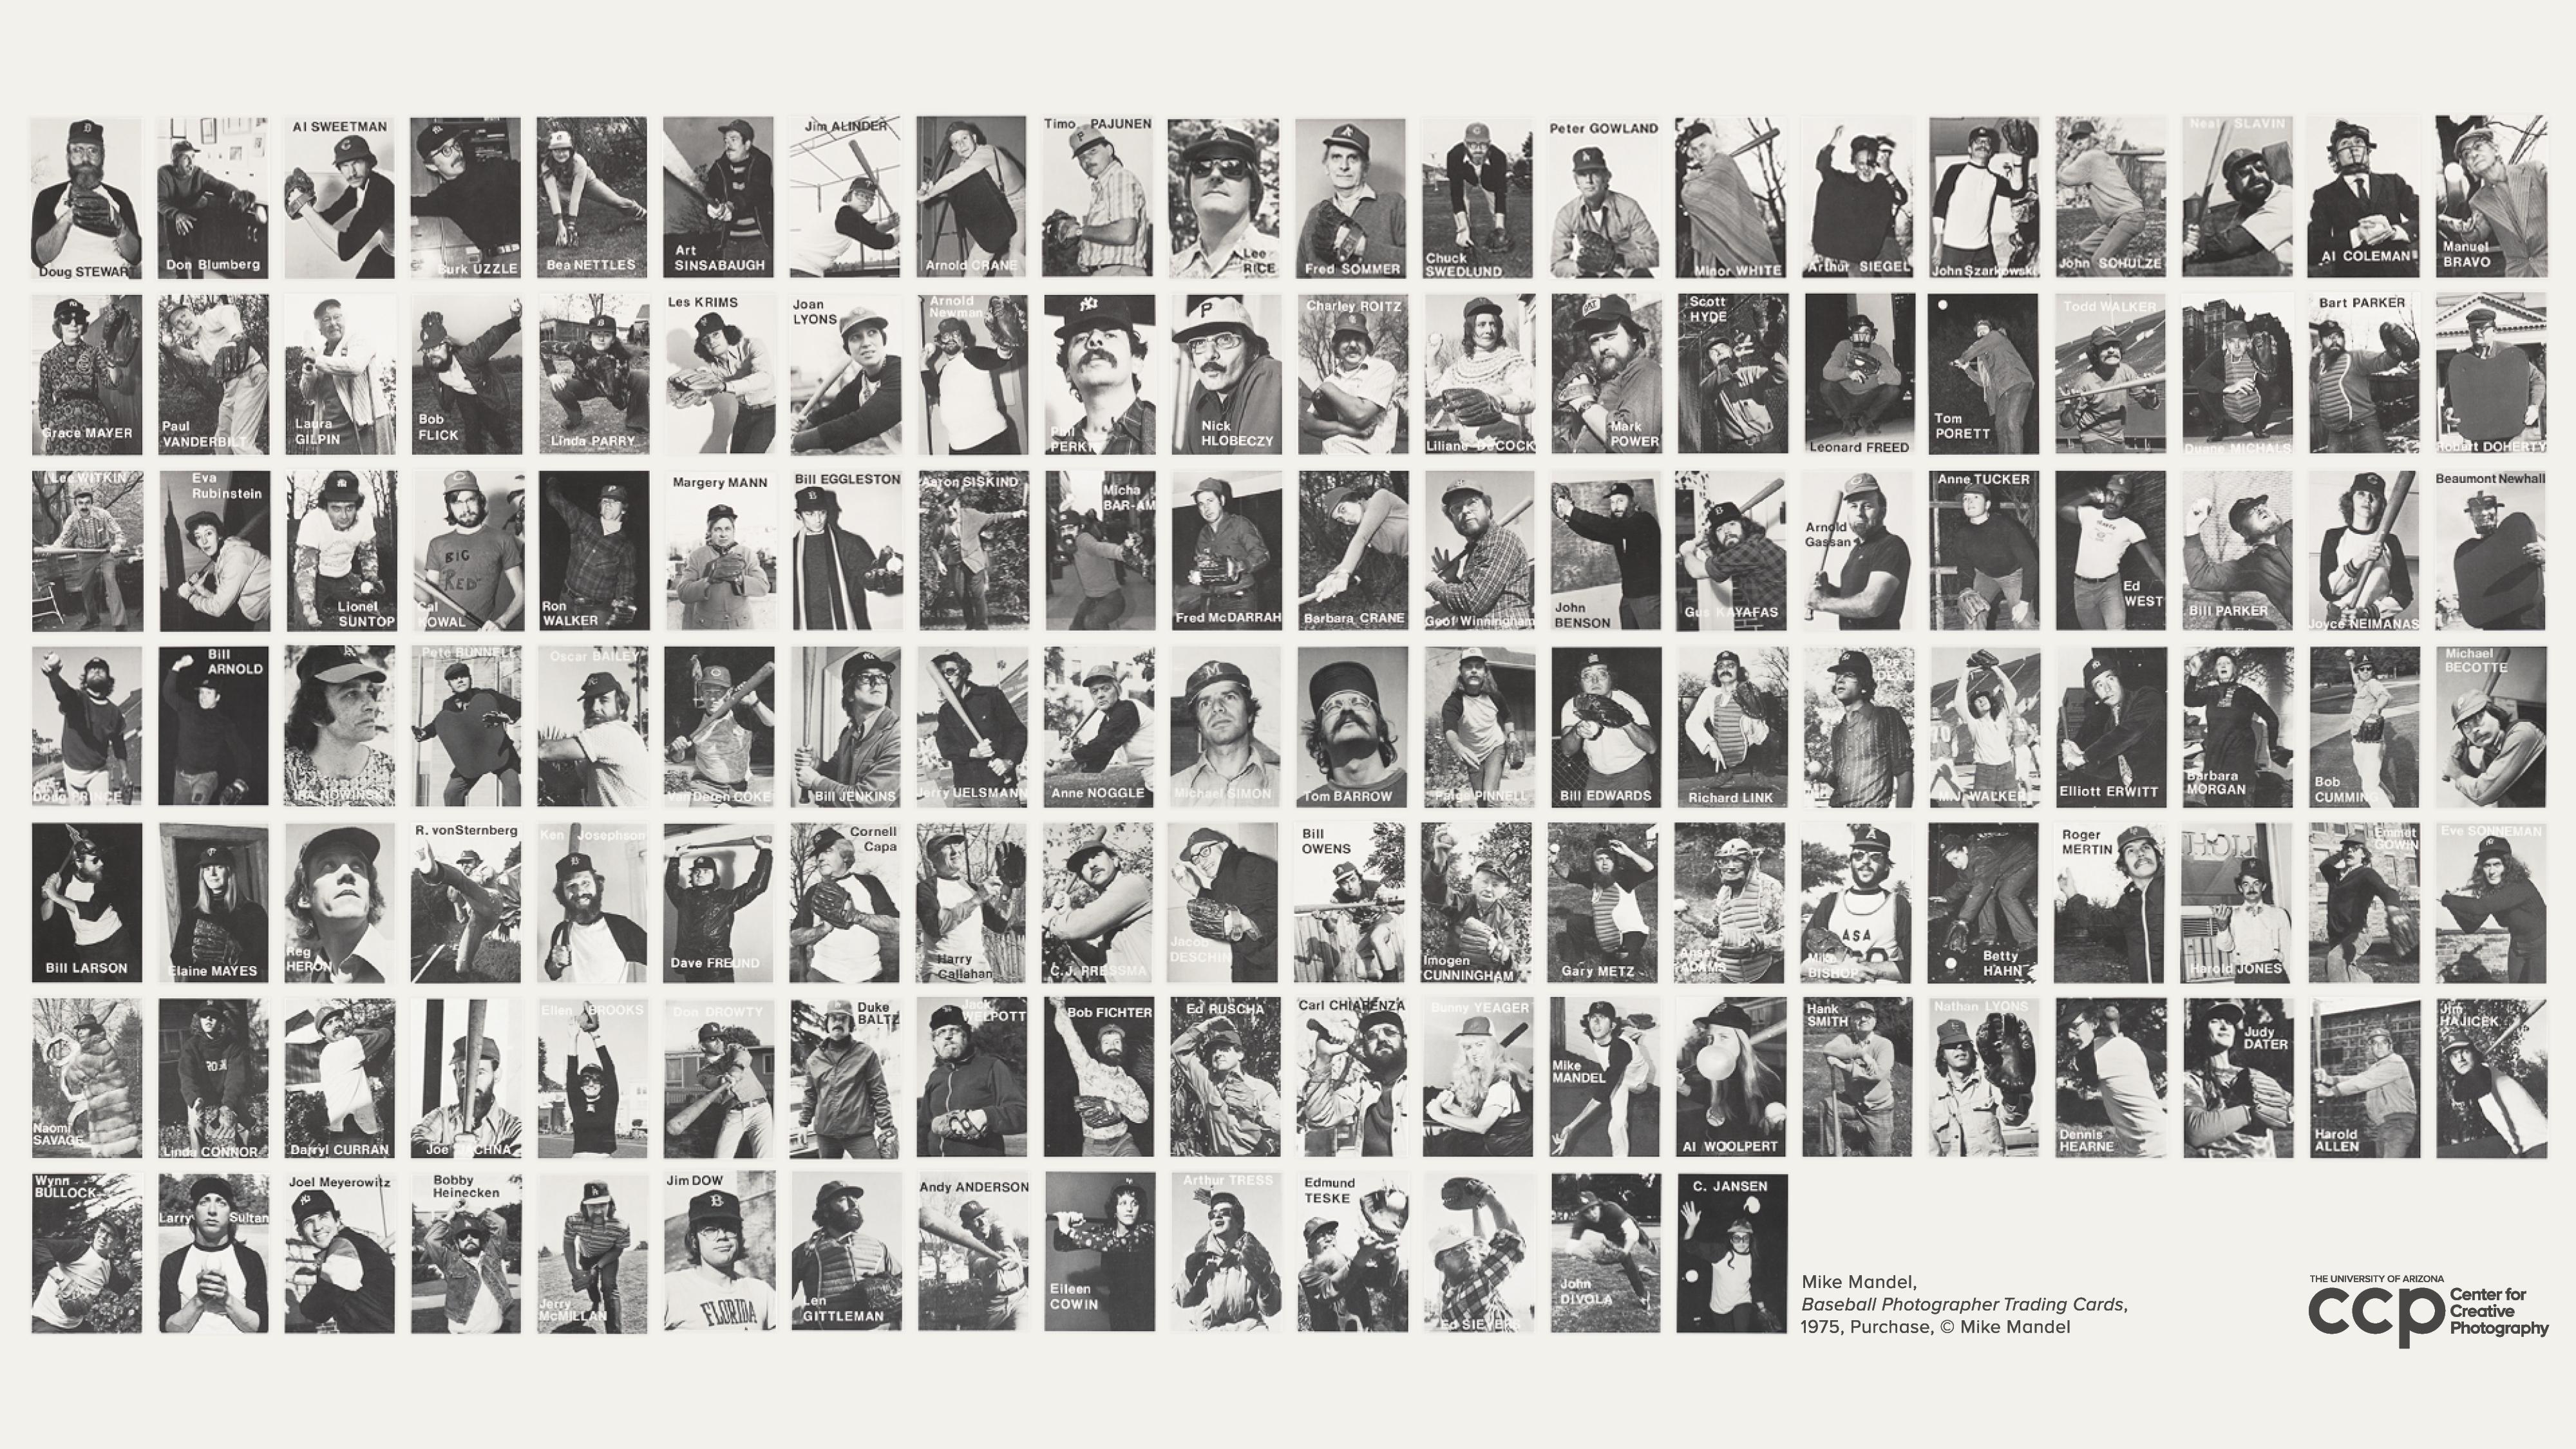 "Mike Mandel, ""Baseball Photographer Trading Cards"" (detail), 1975, Purchase, © Mike Mandel"